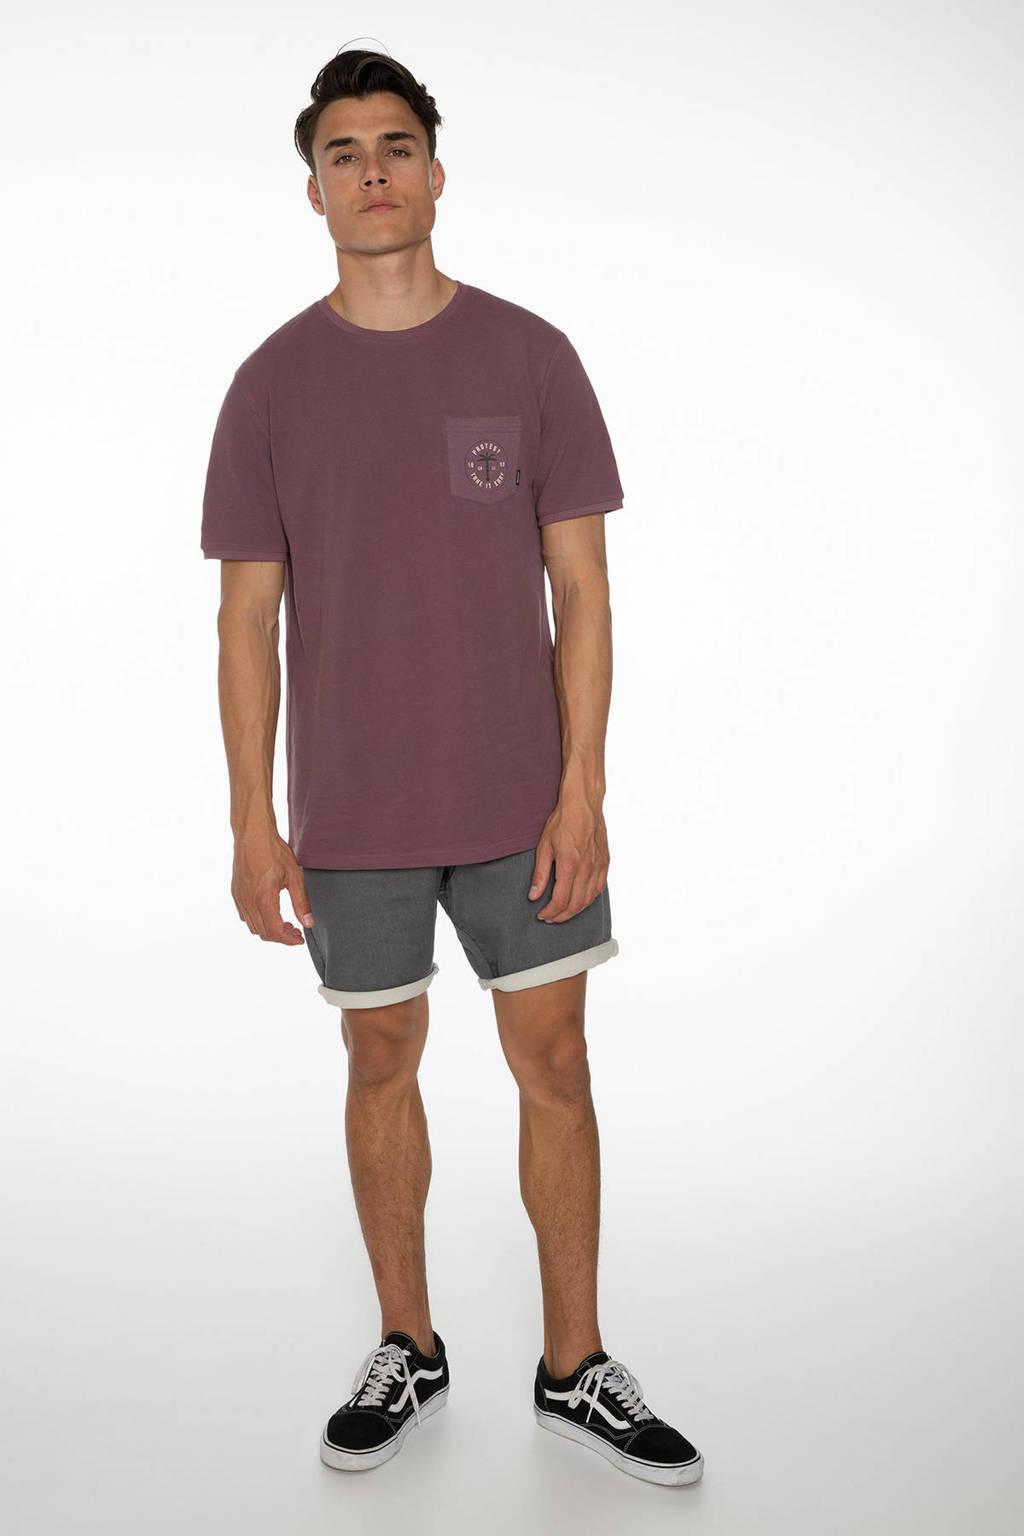 Protest T-shirt Faz paars, Marron Fabric